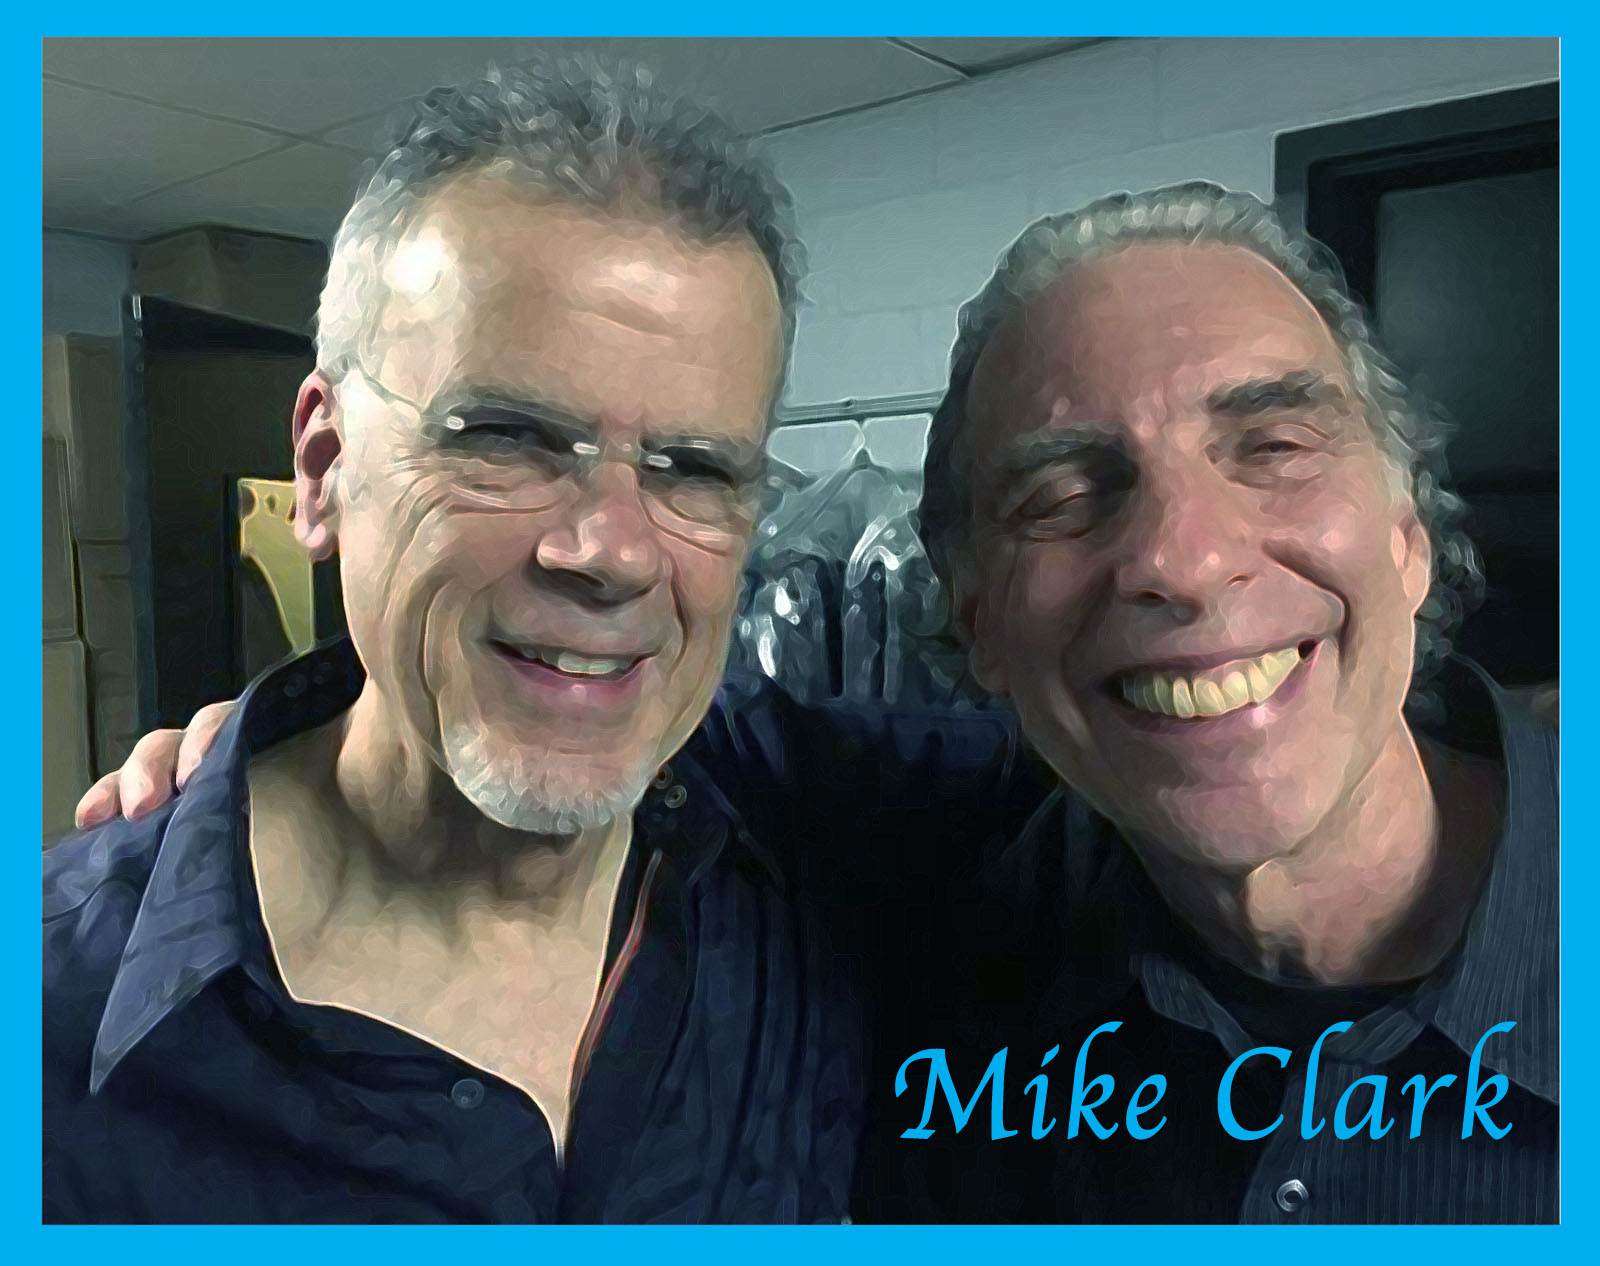 David Garibaldi and Mike Clark